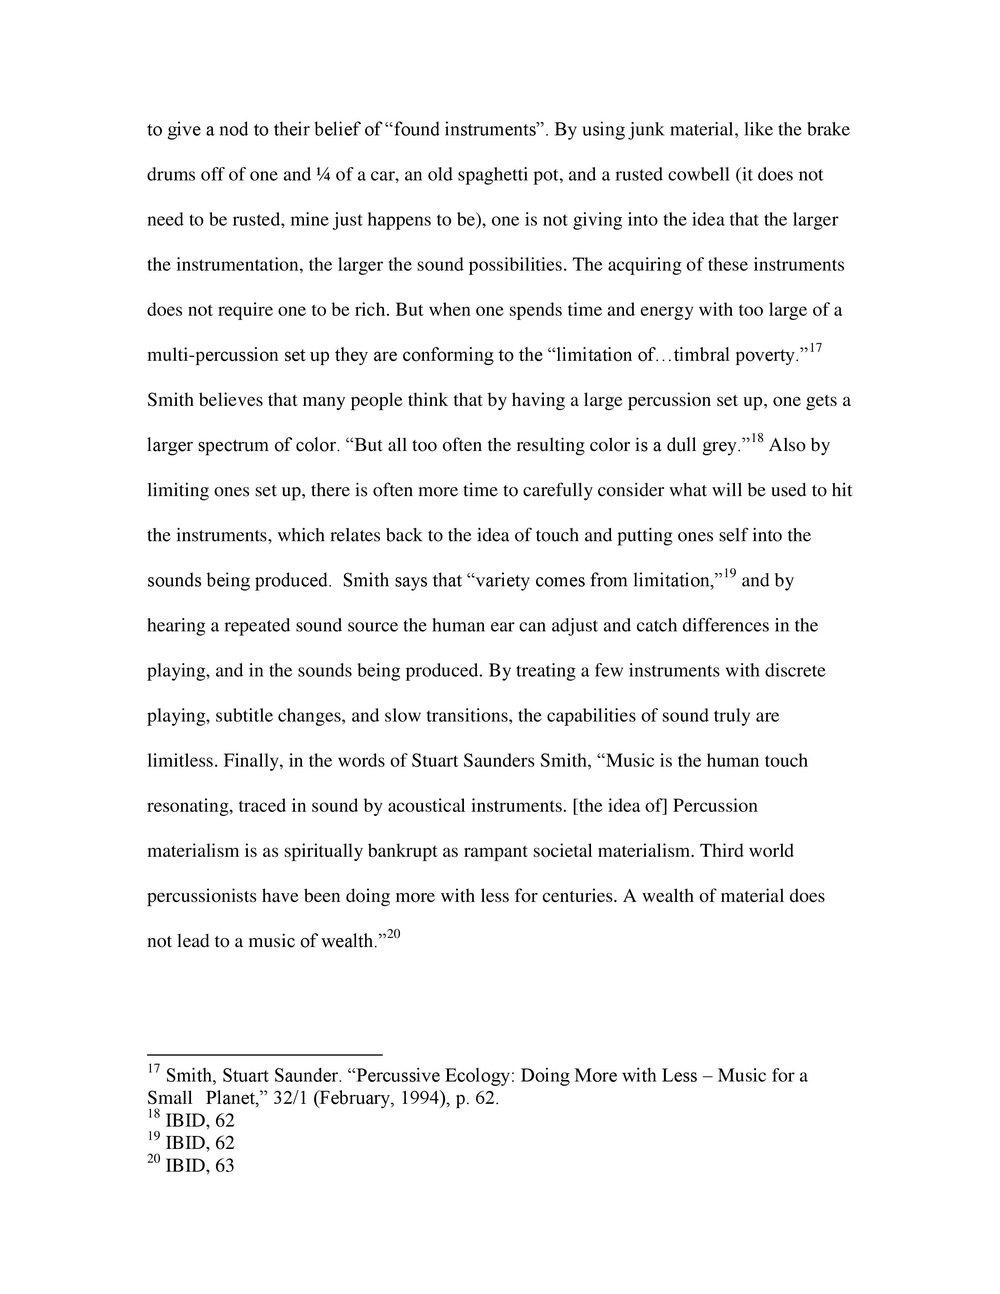 Smith Talk-page-007.jpg